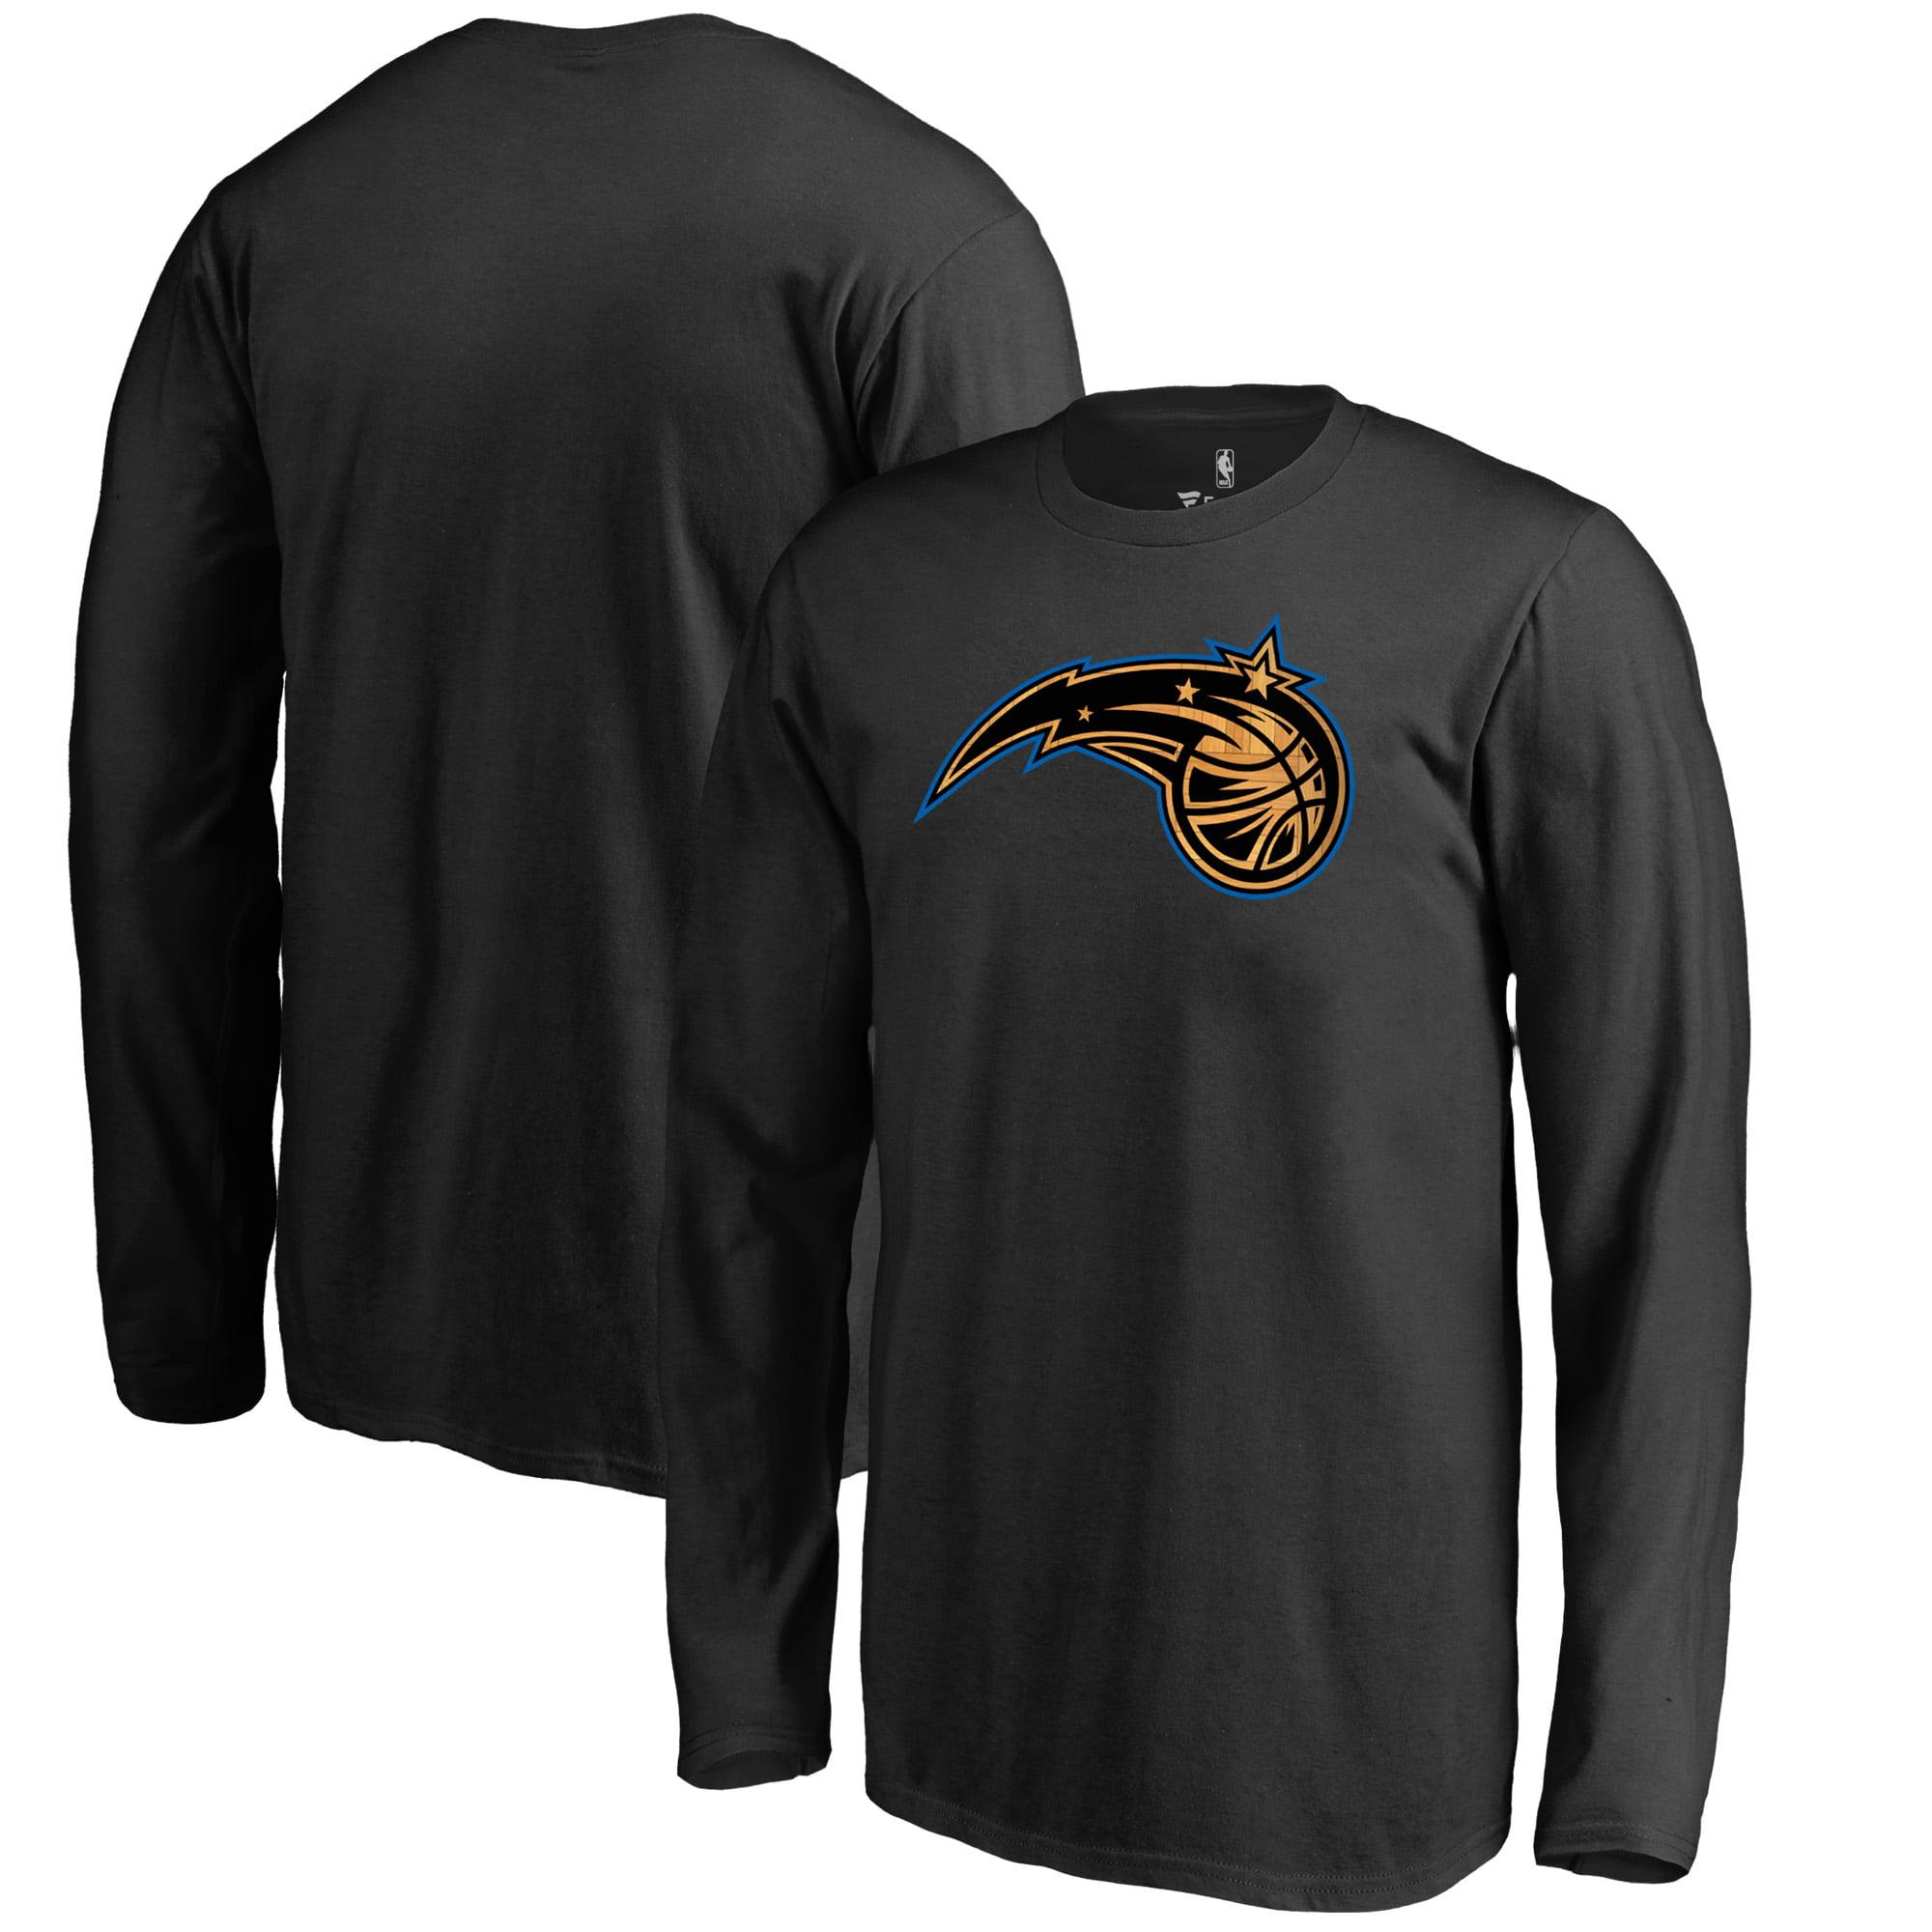 Orlando Magic Fanatics Branded Youth Hardwood Long Sleeve T-Shirt - Black